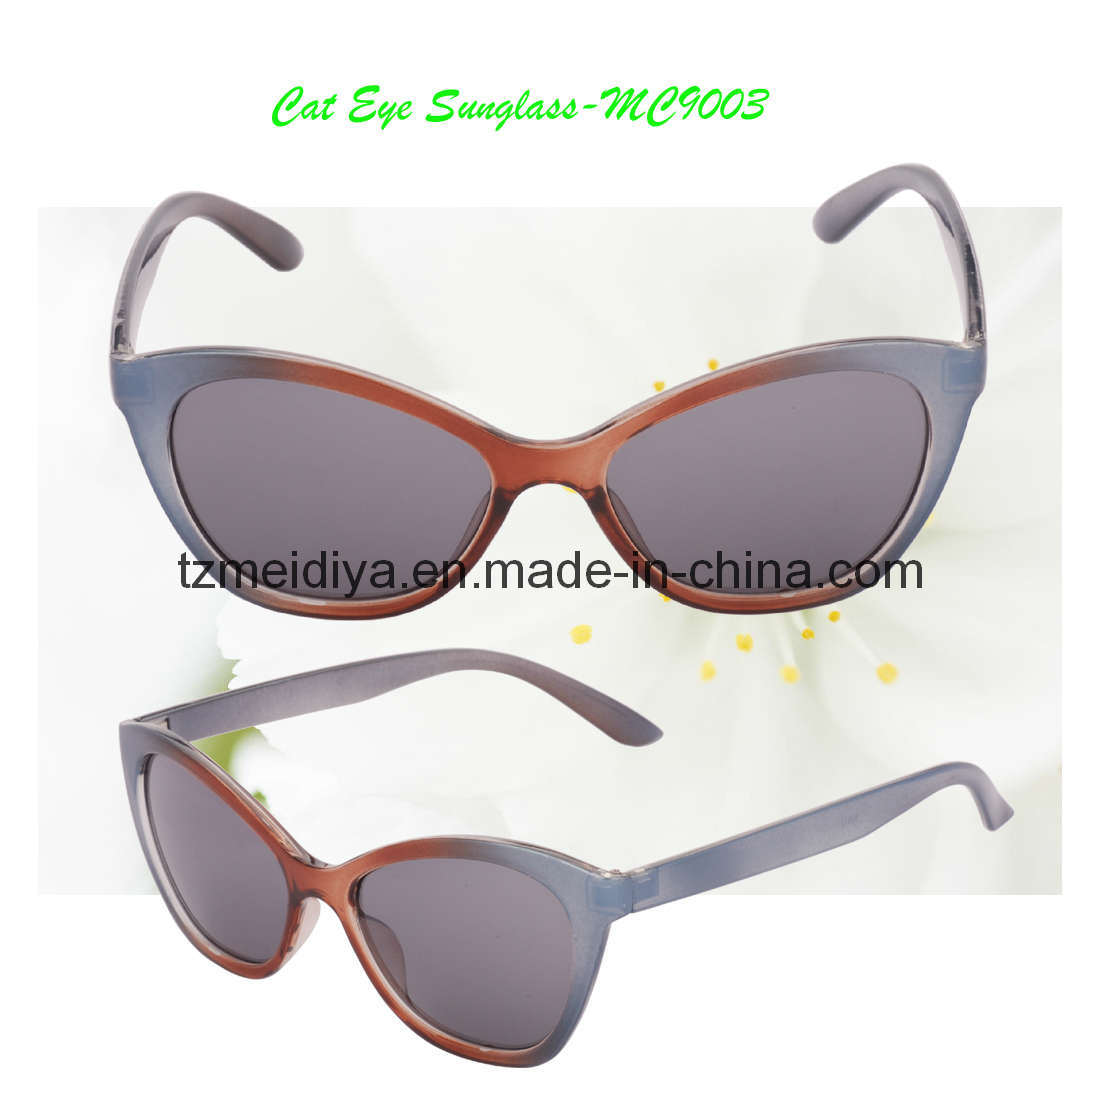 BRIDGE EYEGLASS FRAME SADDLE - Eyeglasses Online